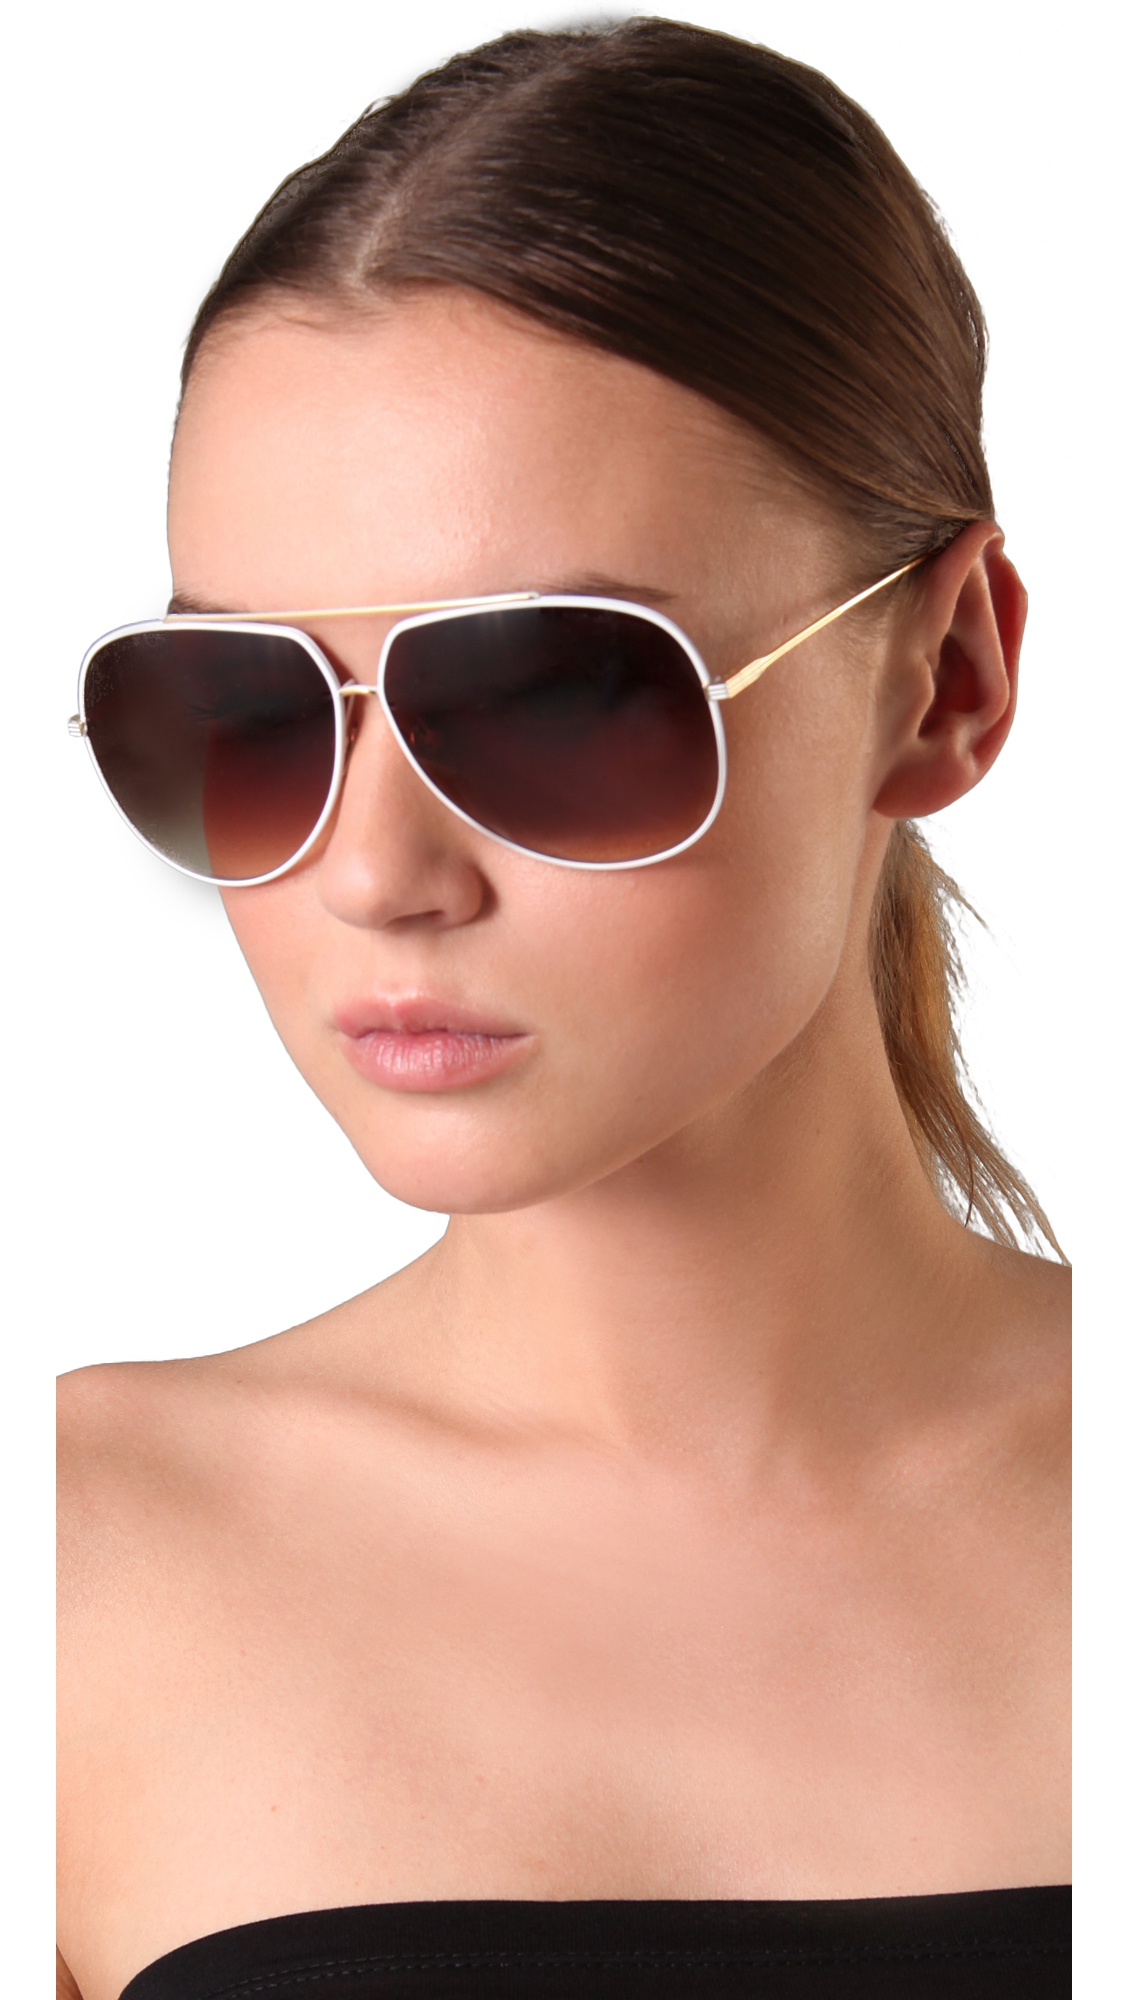 sol de Gafas de sol Gafas Gafas sol Gafas de de Gafas sol de sol Gafas ZqqYRE